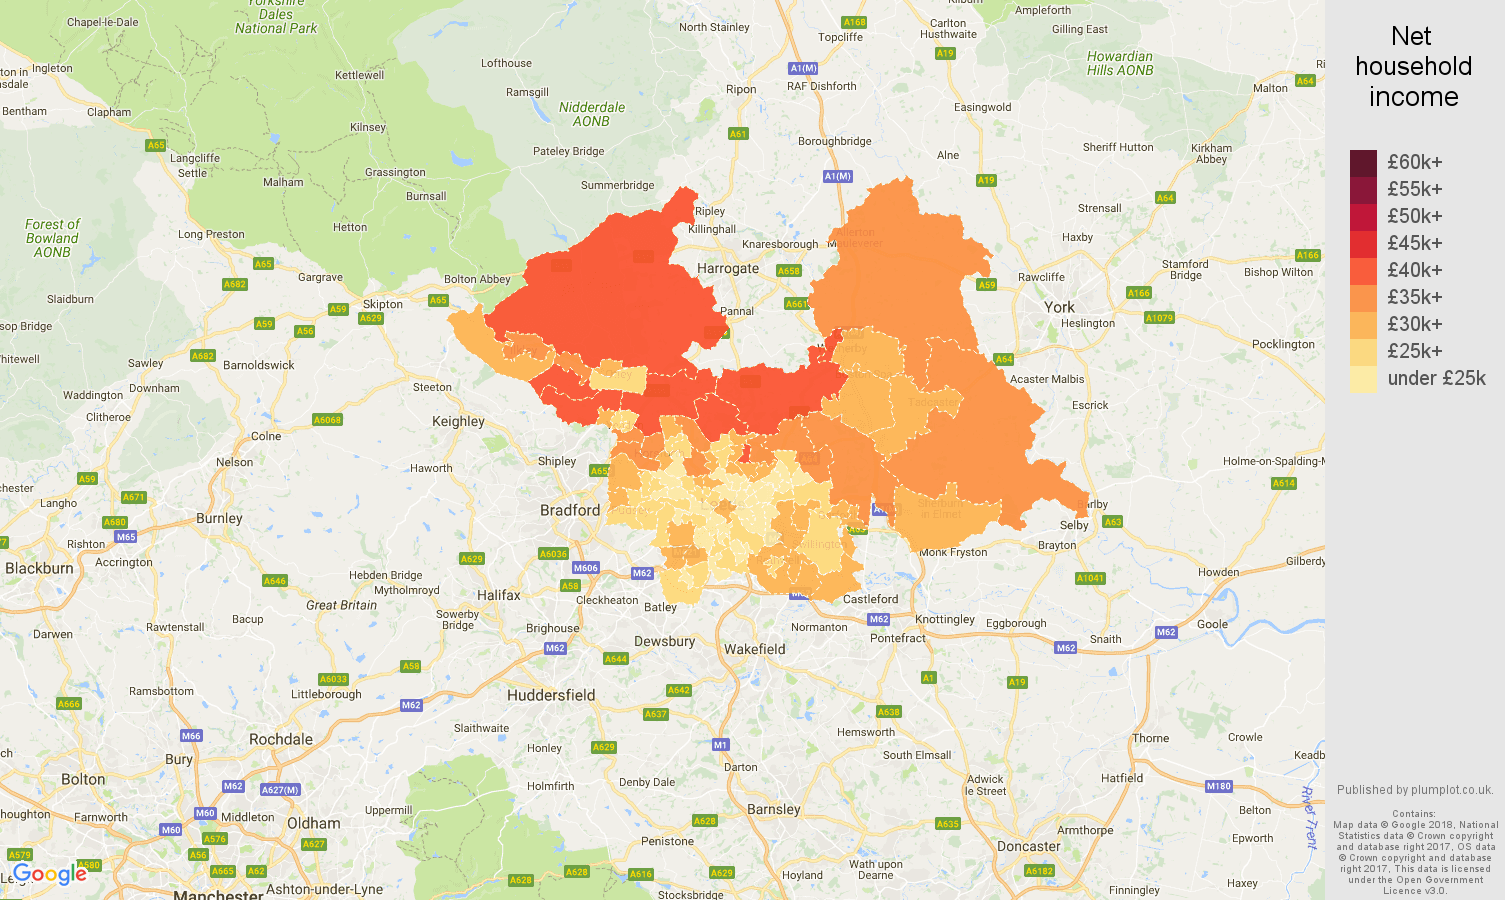 Leeds net household income map